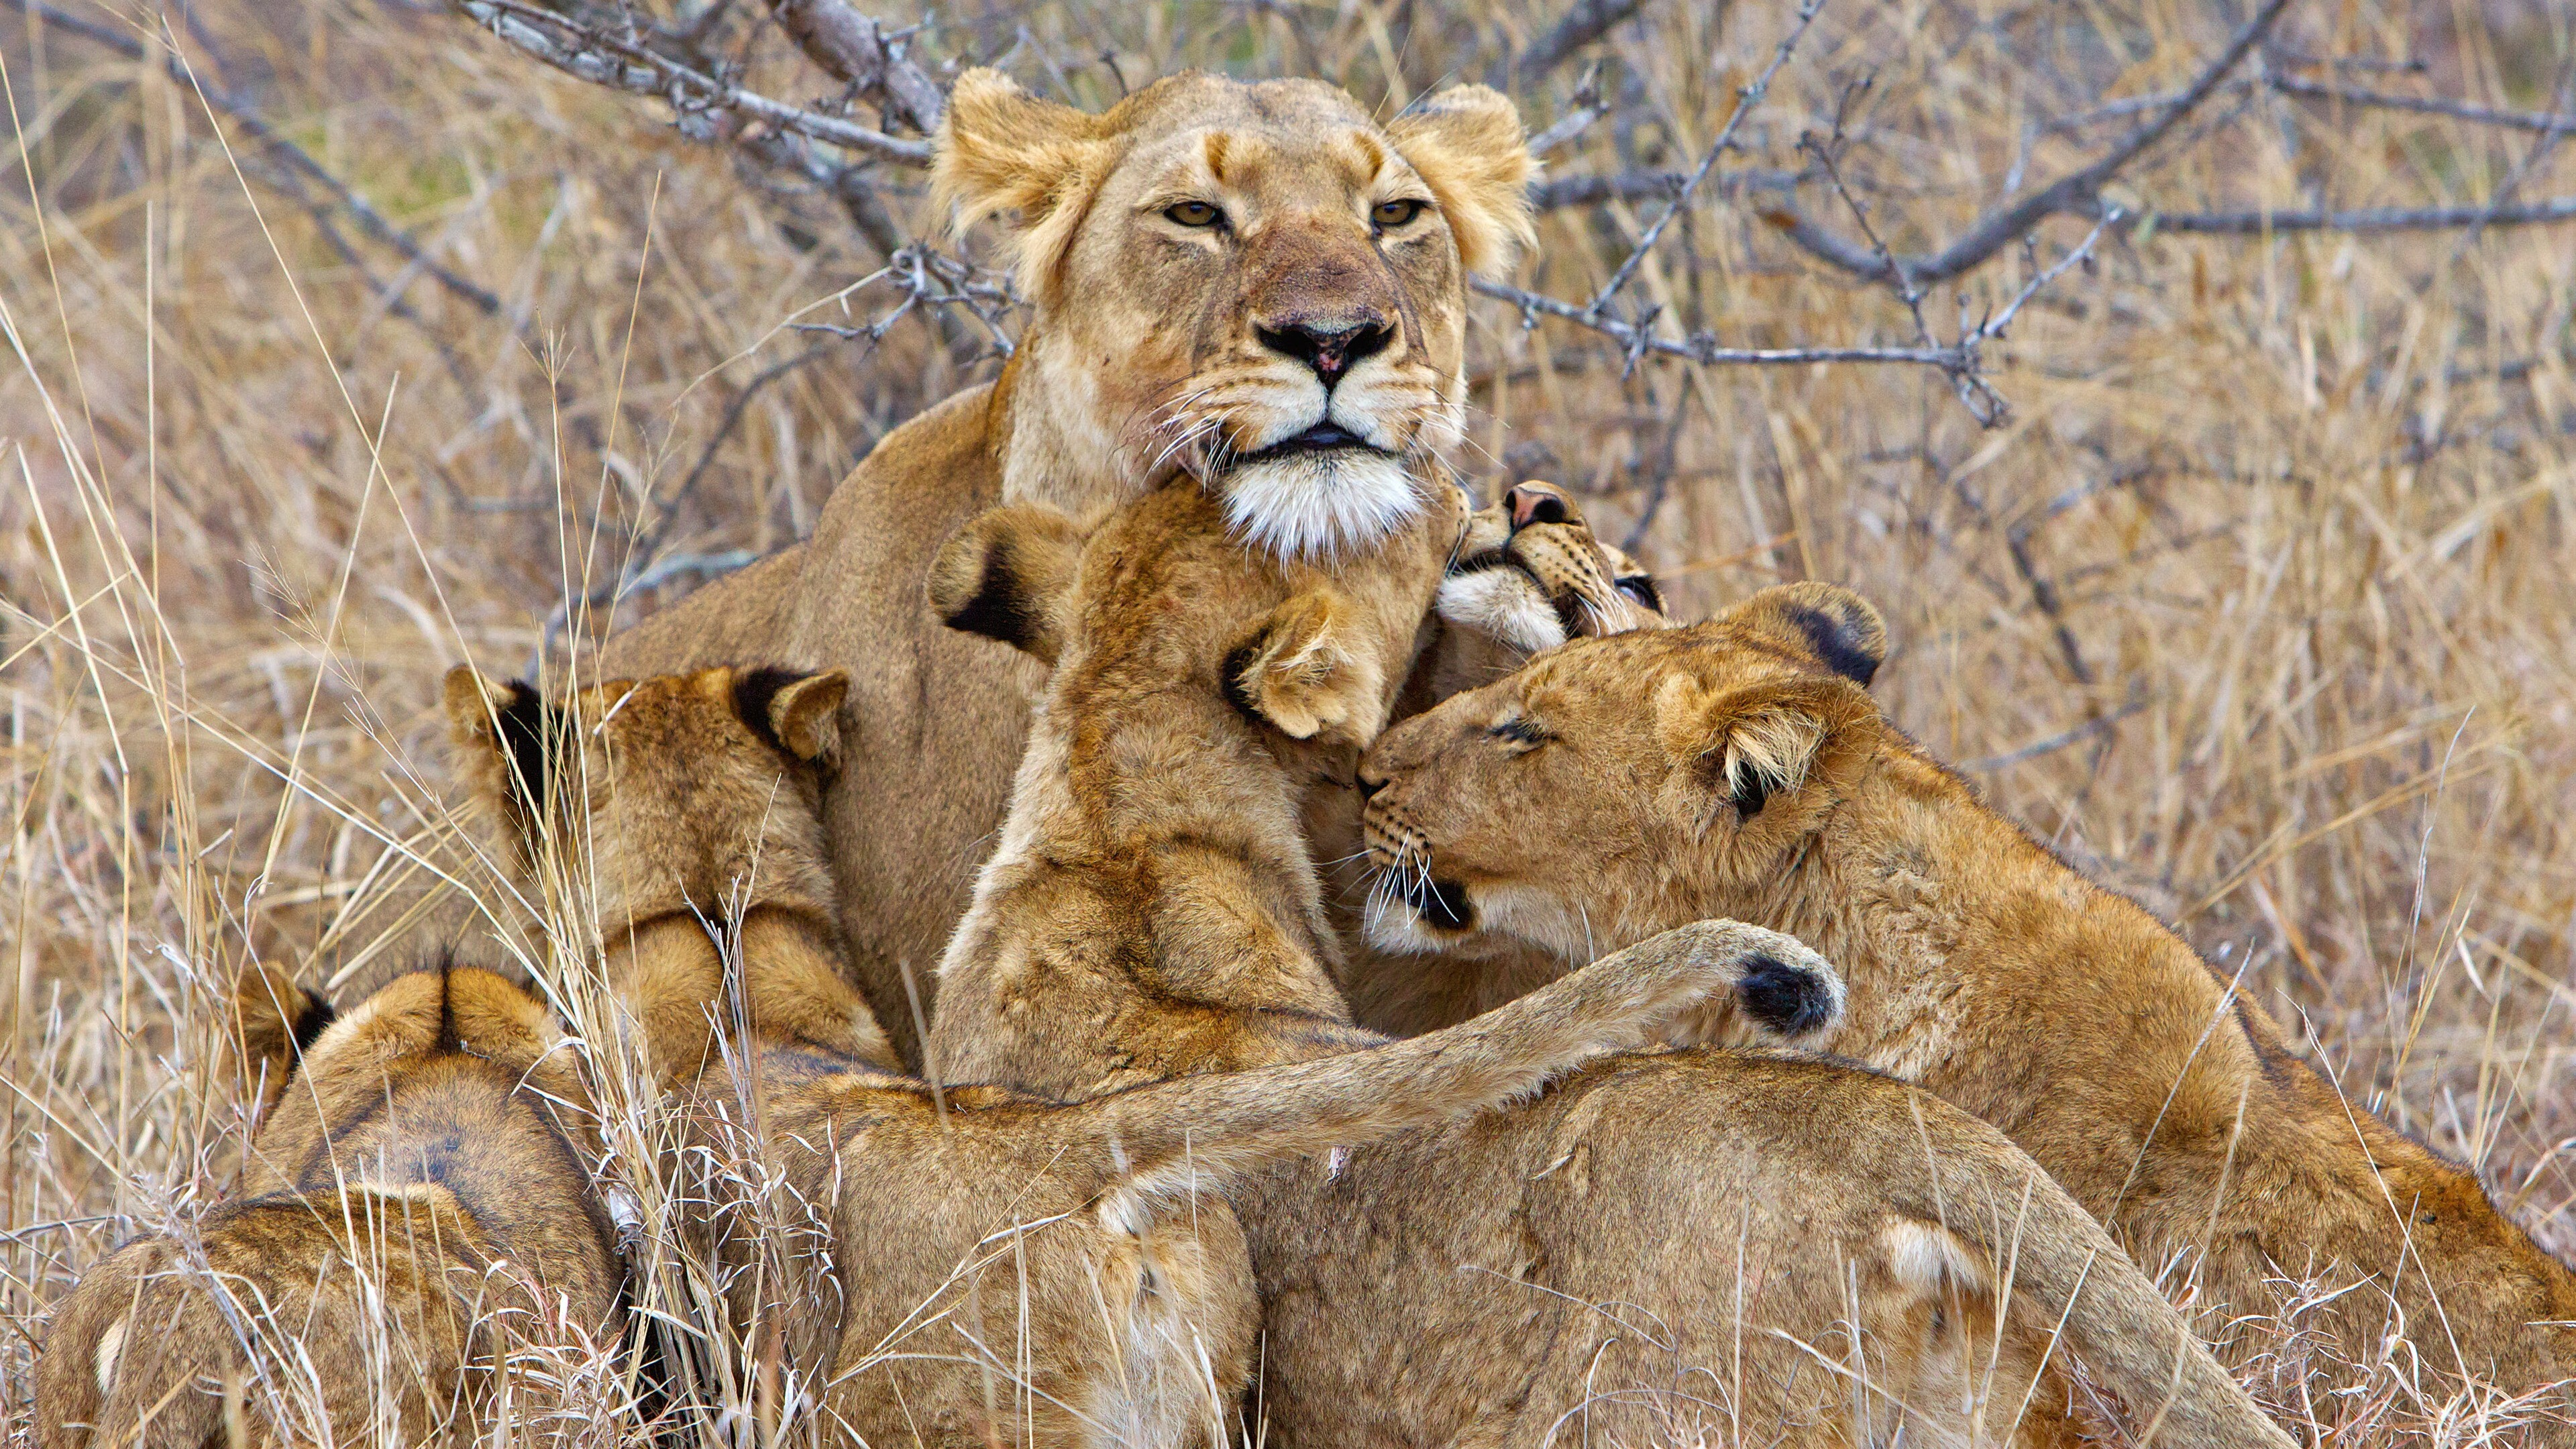 Lion family wallpaper - photo#40